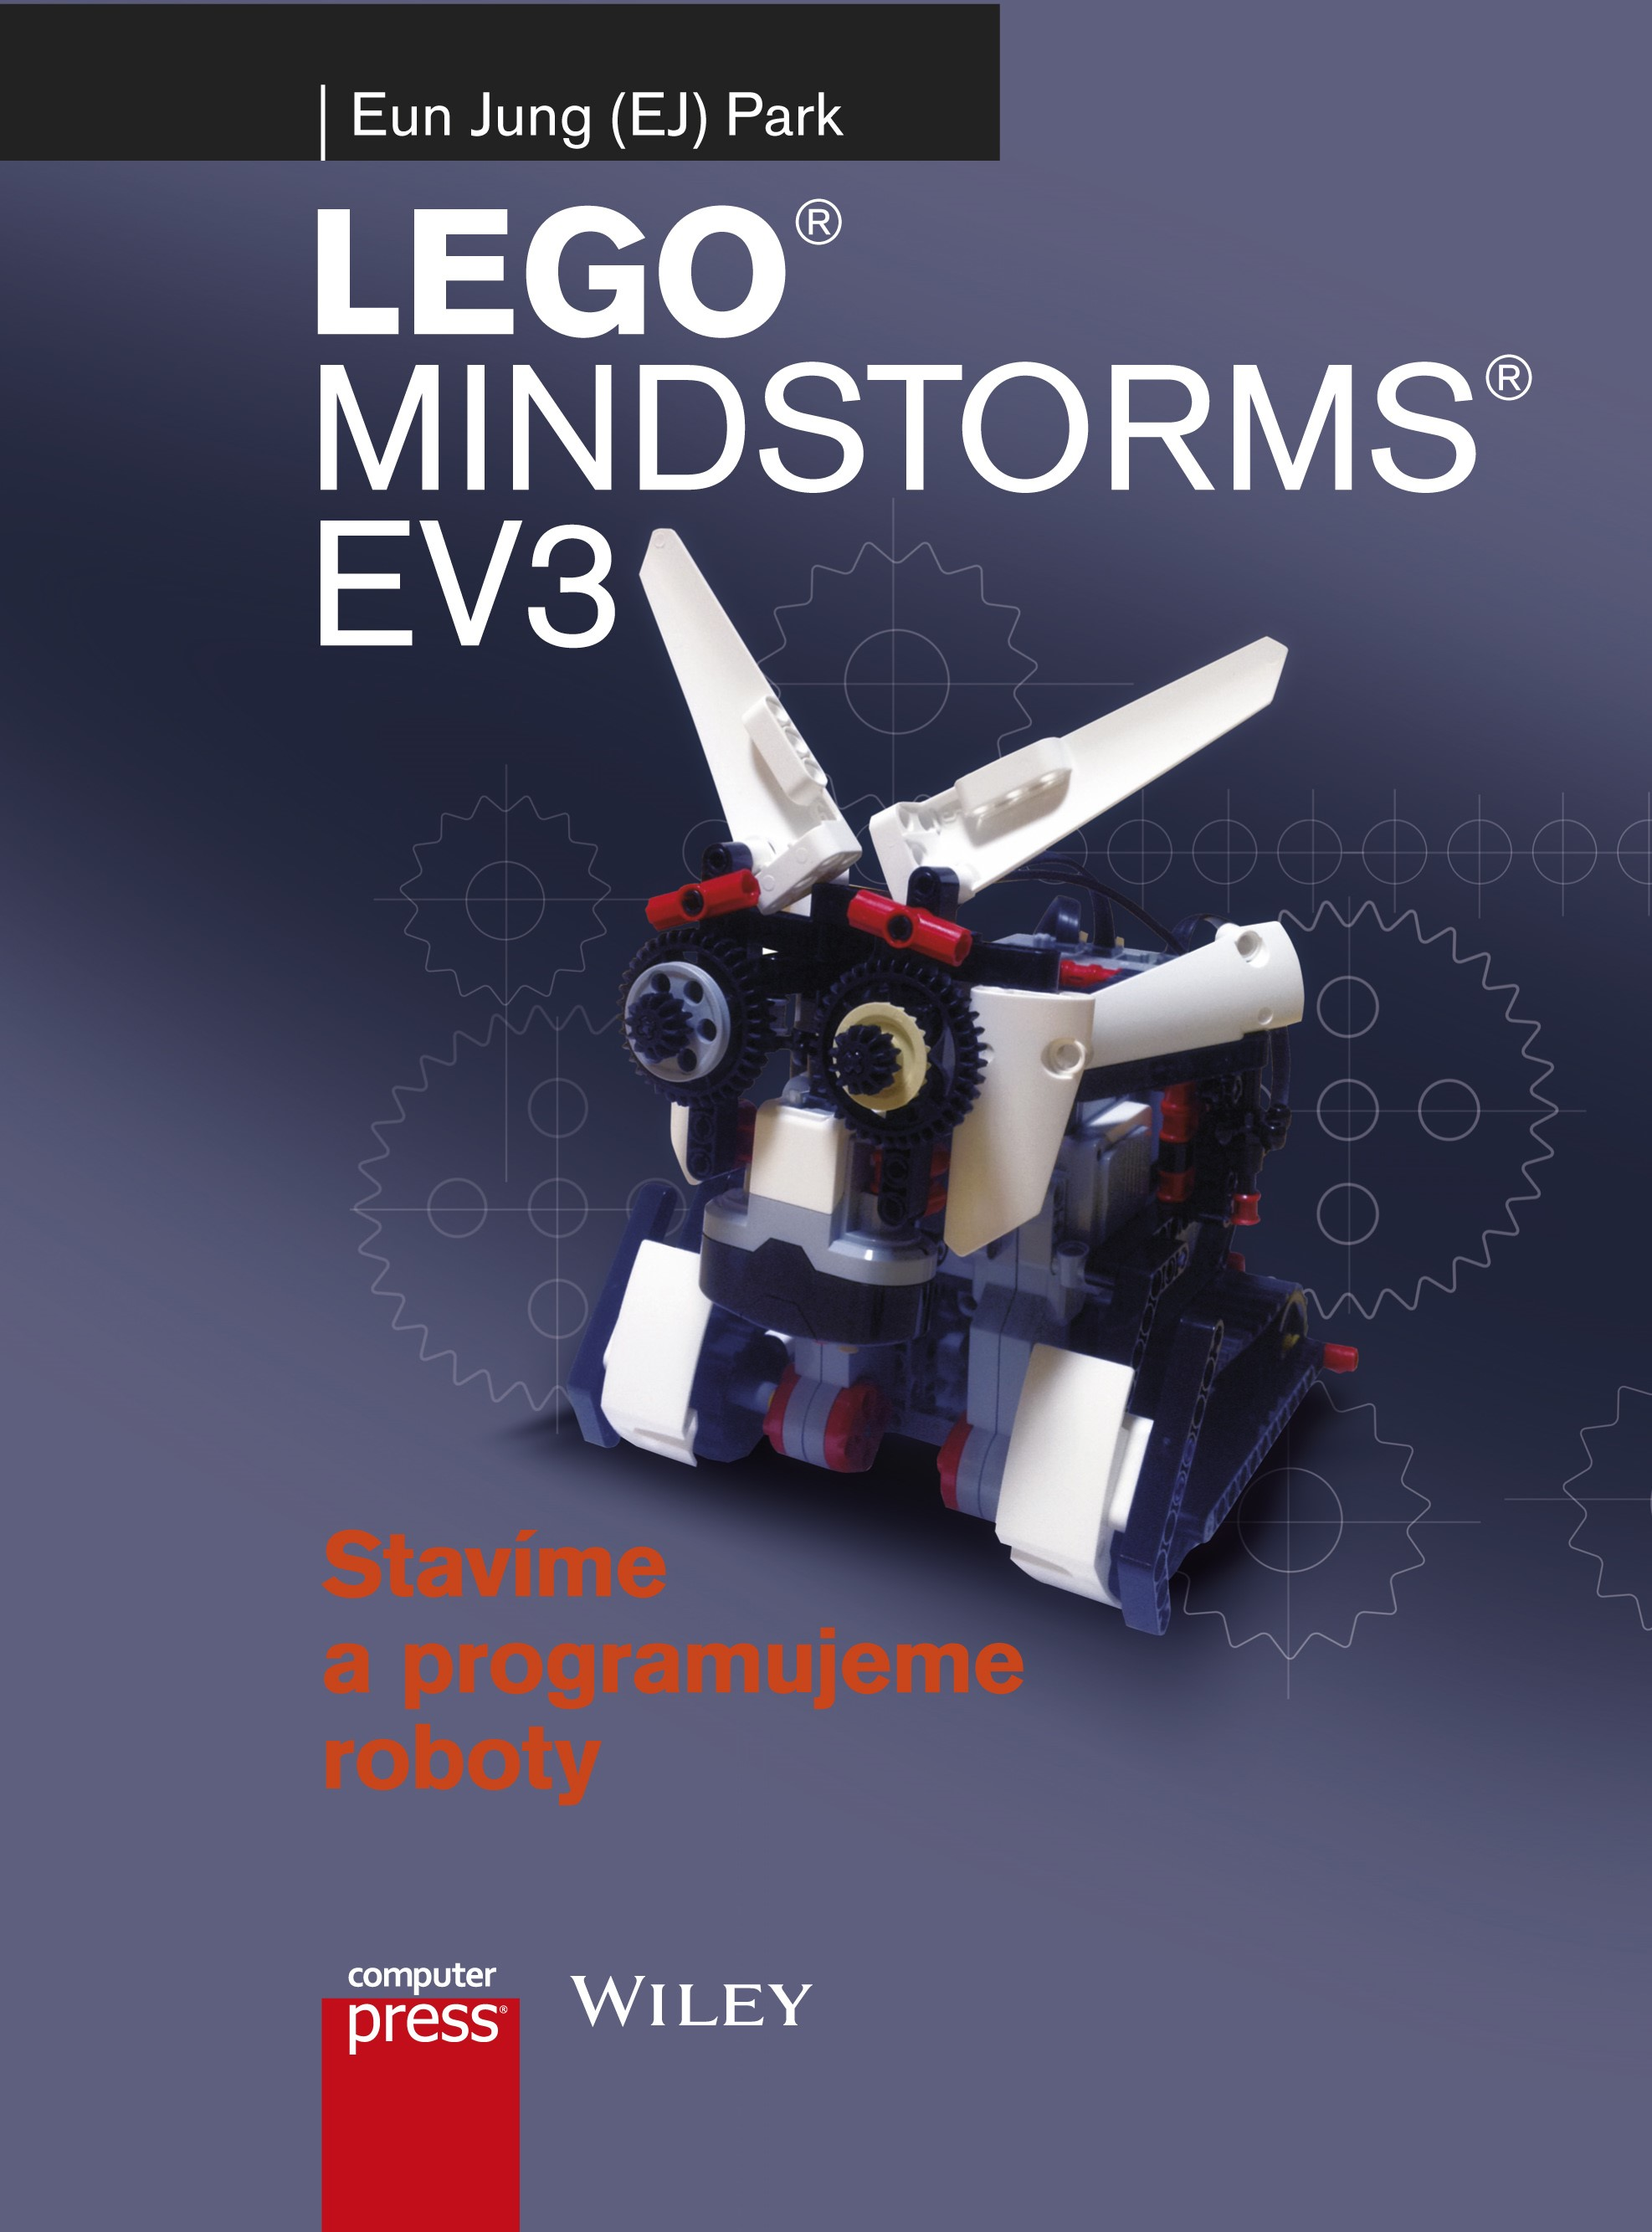 LEGO® MINDSTORMS® EV3 | Eun Jung (EJ) Park